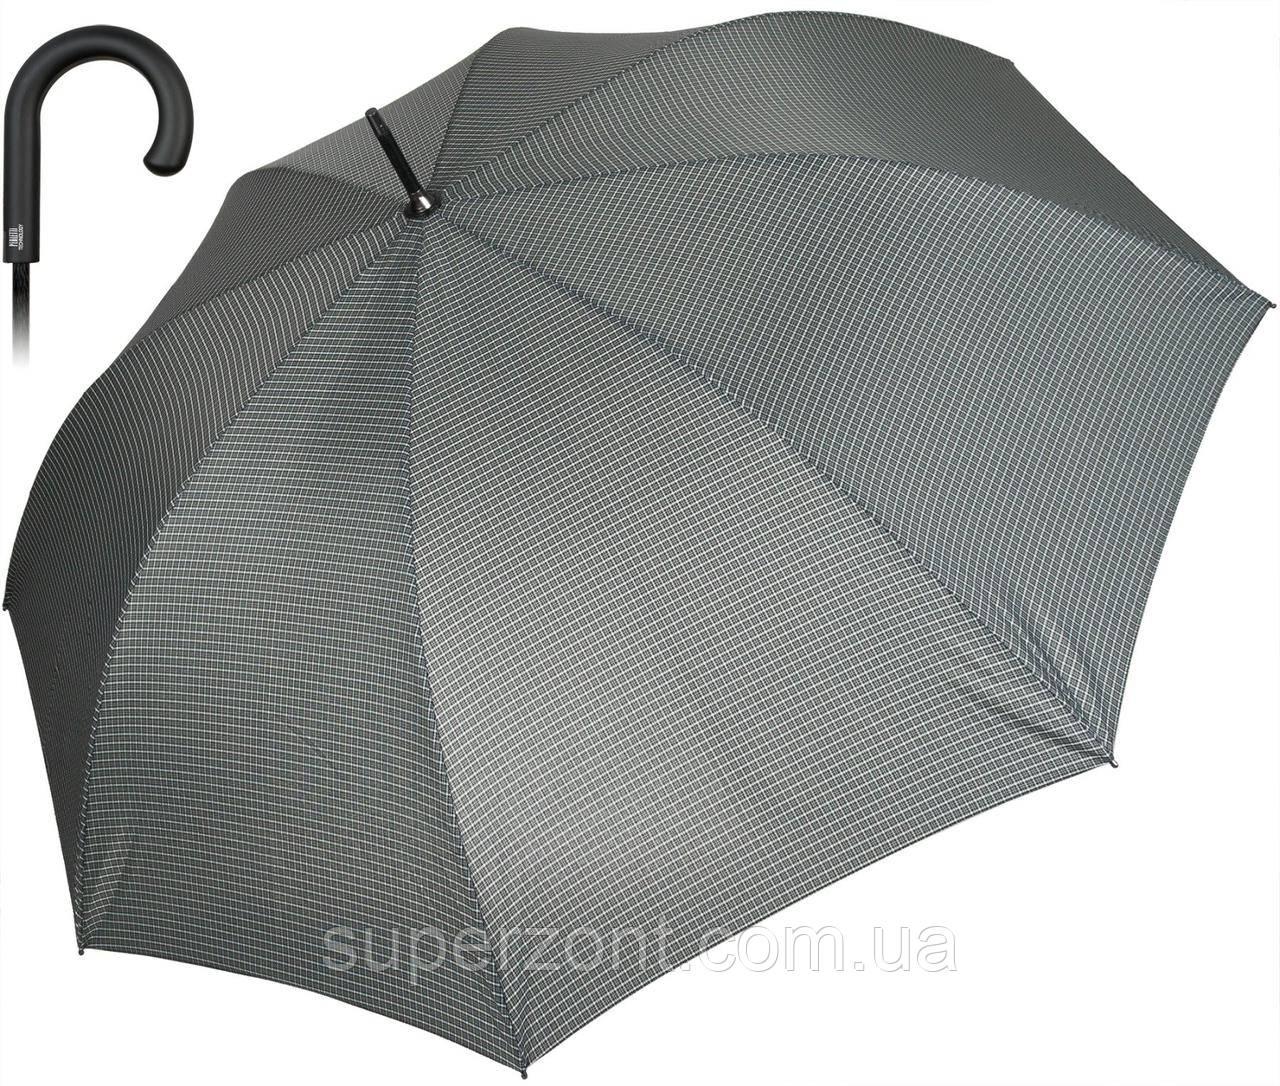 Зонт-трость, полуавтомат Perletti Technology 21612.3;7669, темно серый